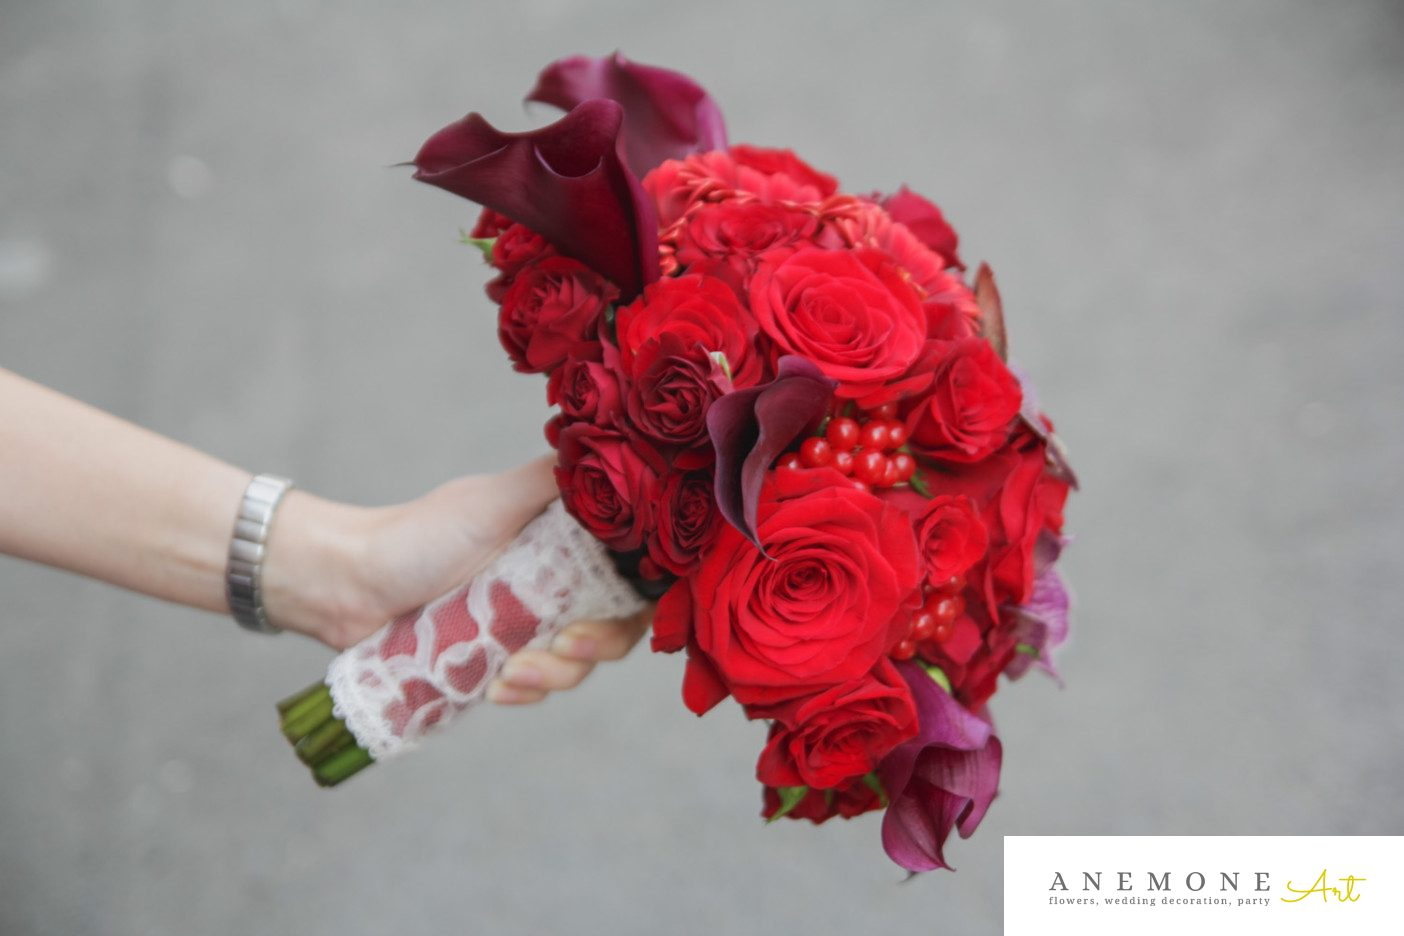 Poza, foto cu Flori de nunta buchet mireasa, calla, orhidee, rosu, trandafiri, vanda, visiniu in Arad, Timisoara, Oradea (wedding flowers, bouquets) nunta Arad, Timisoara, Oradea